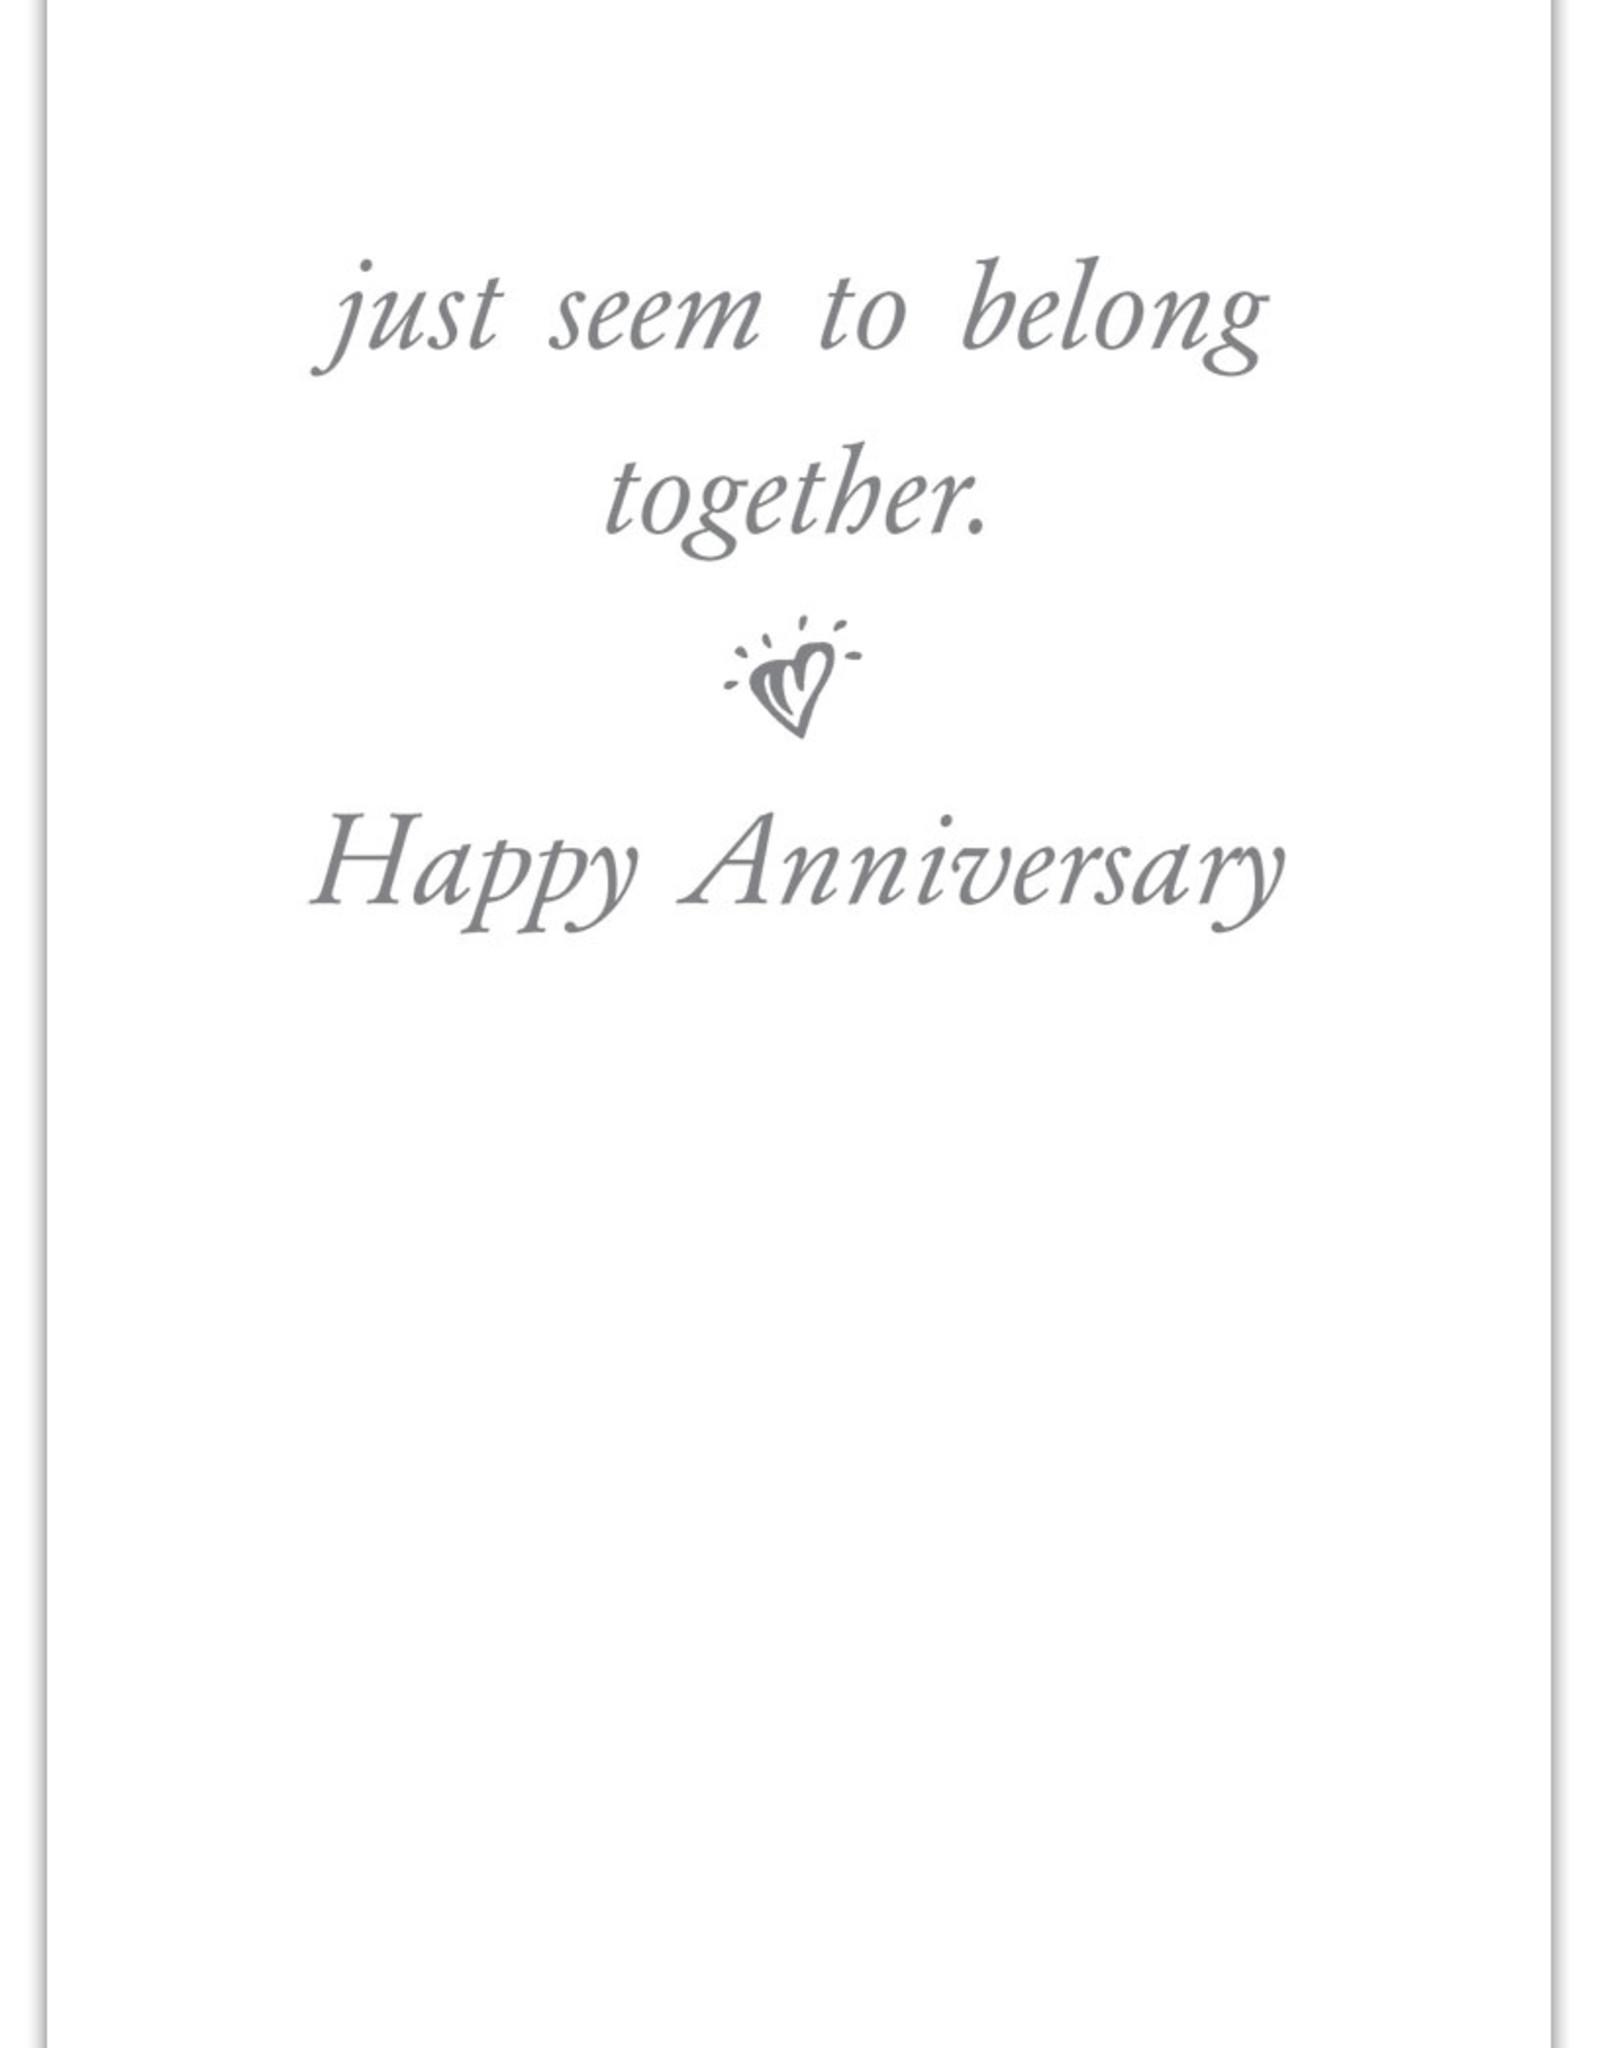 Cardthartic Cardthartic - Heart Shutters Anniversary Card